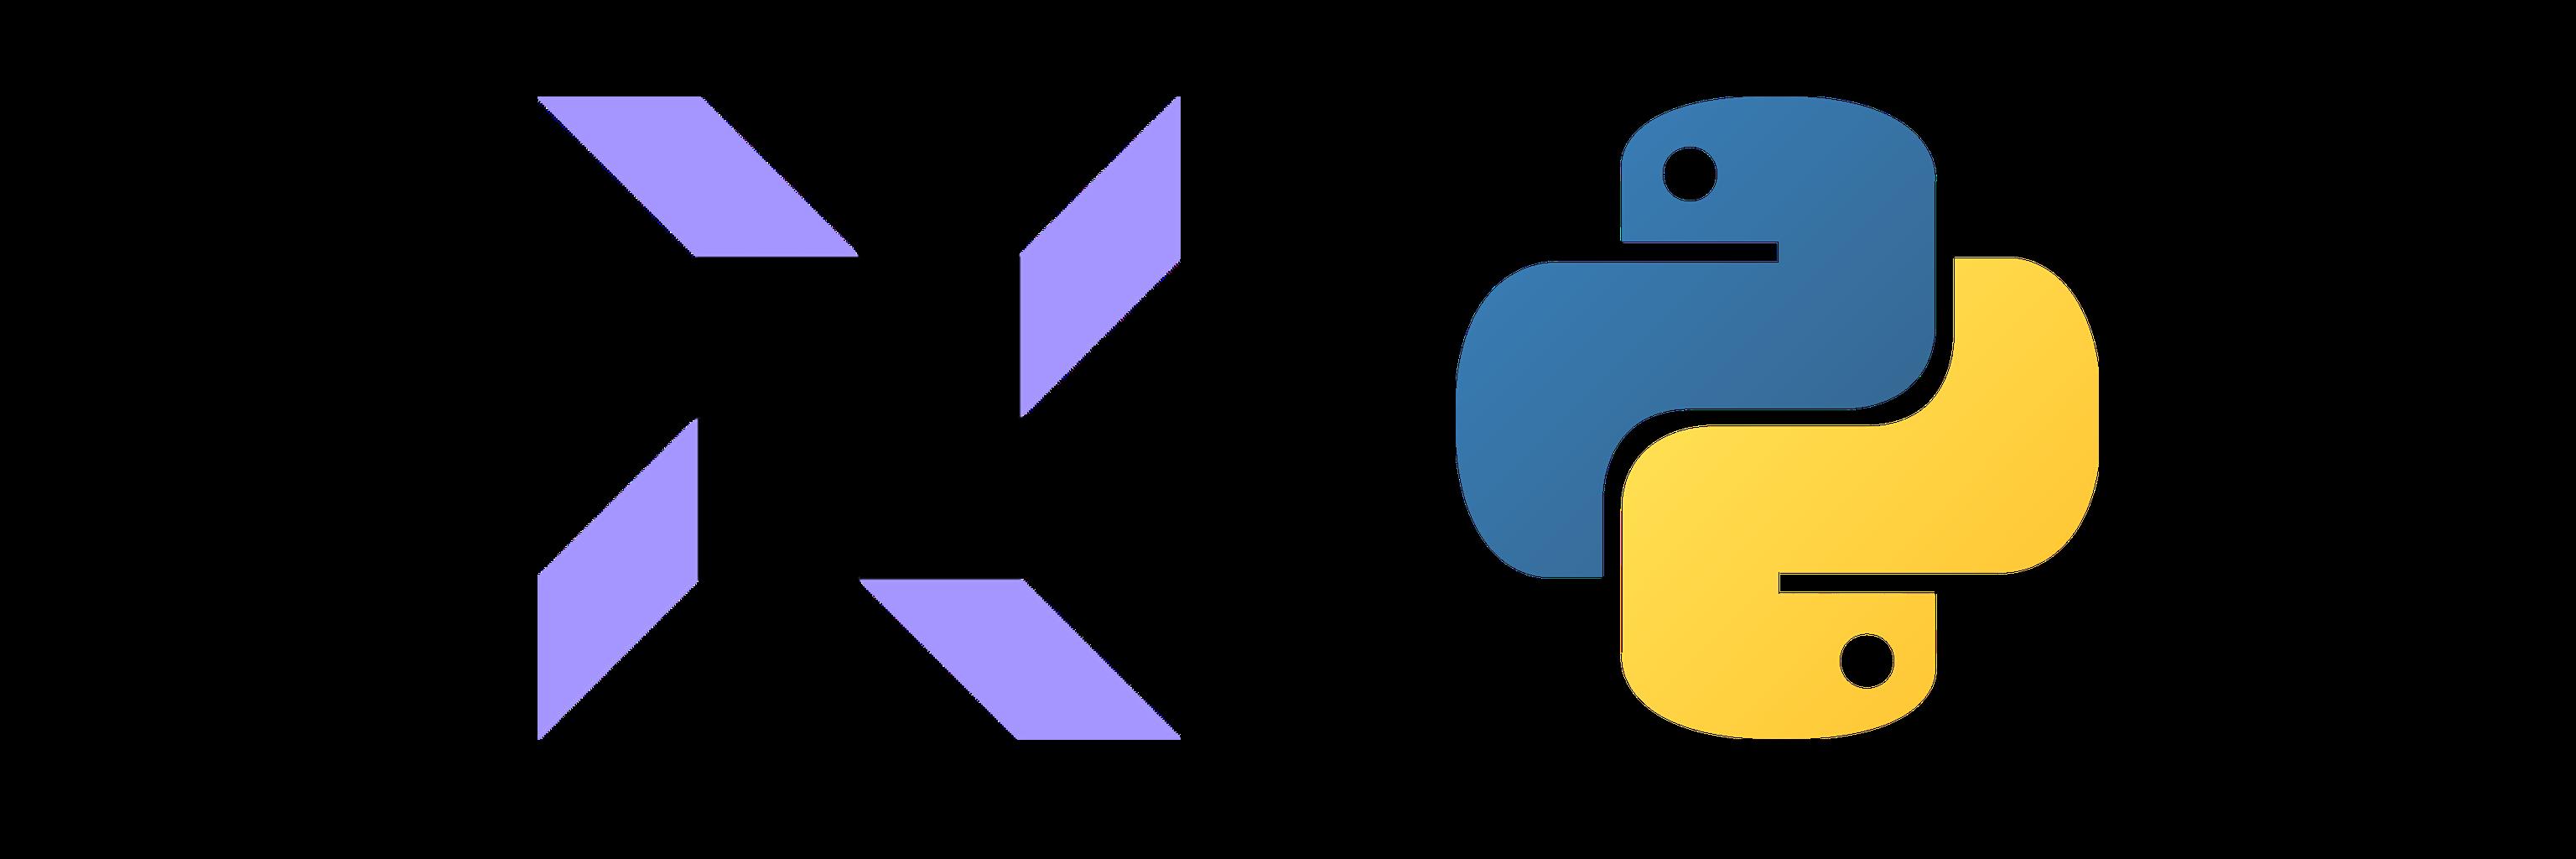 osquery-python-logo